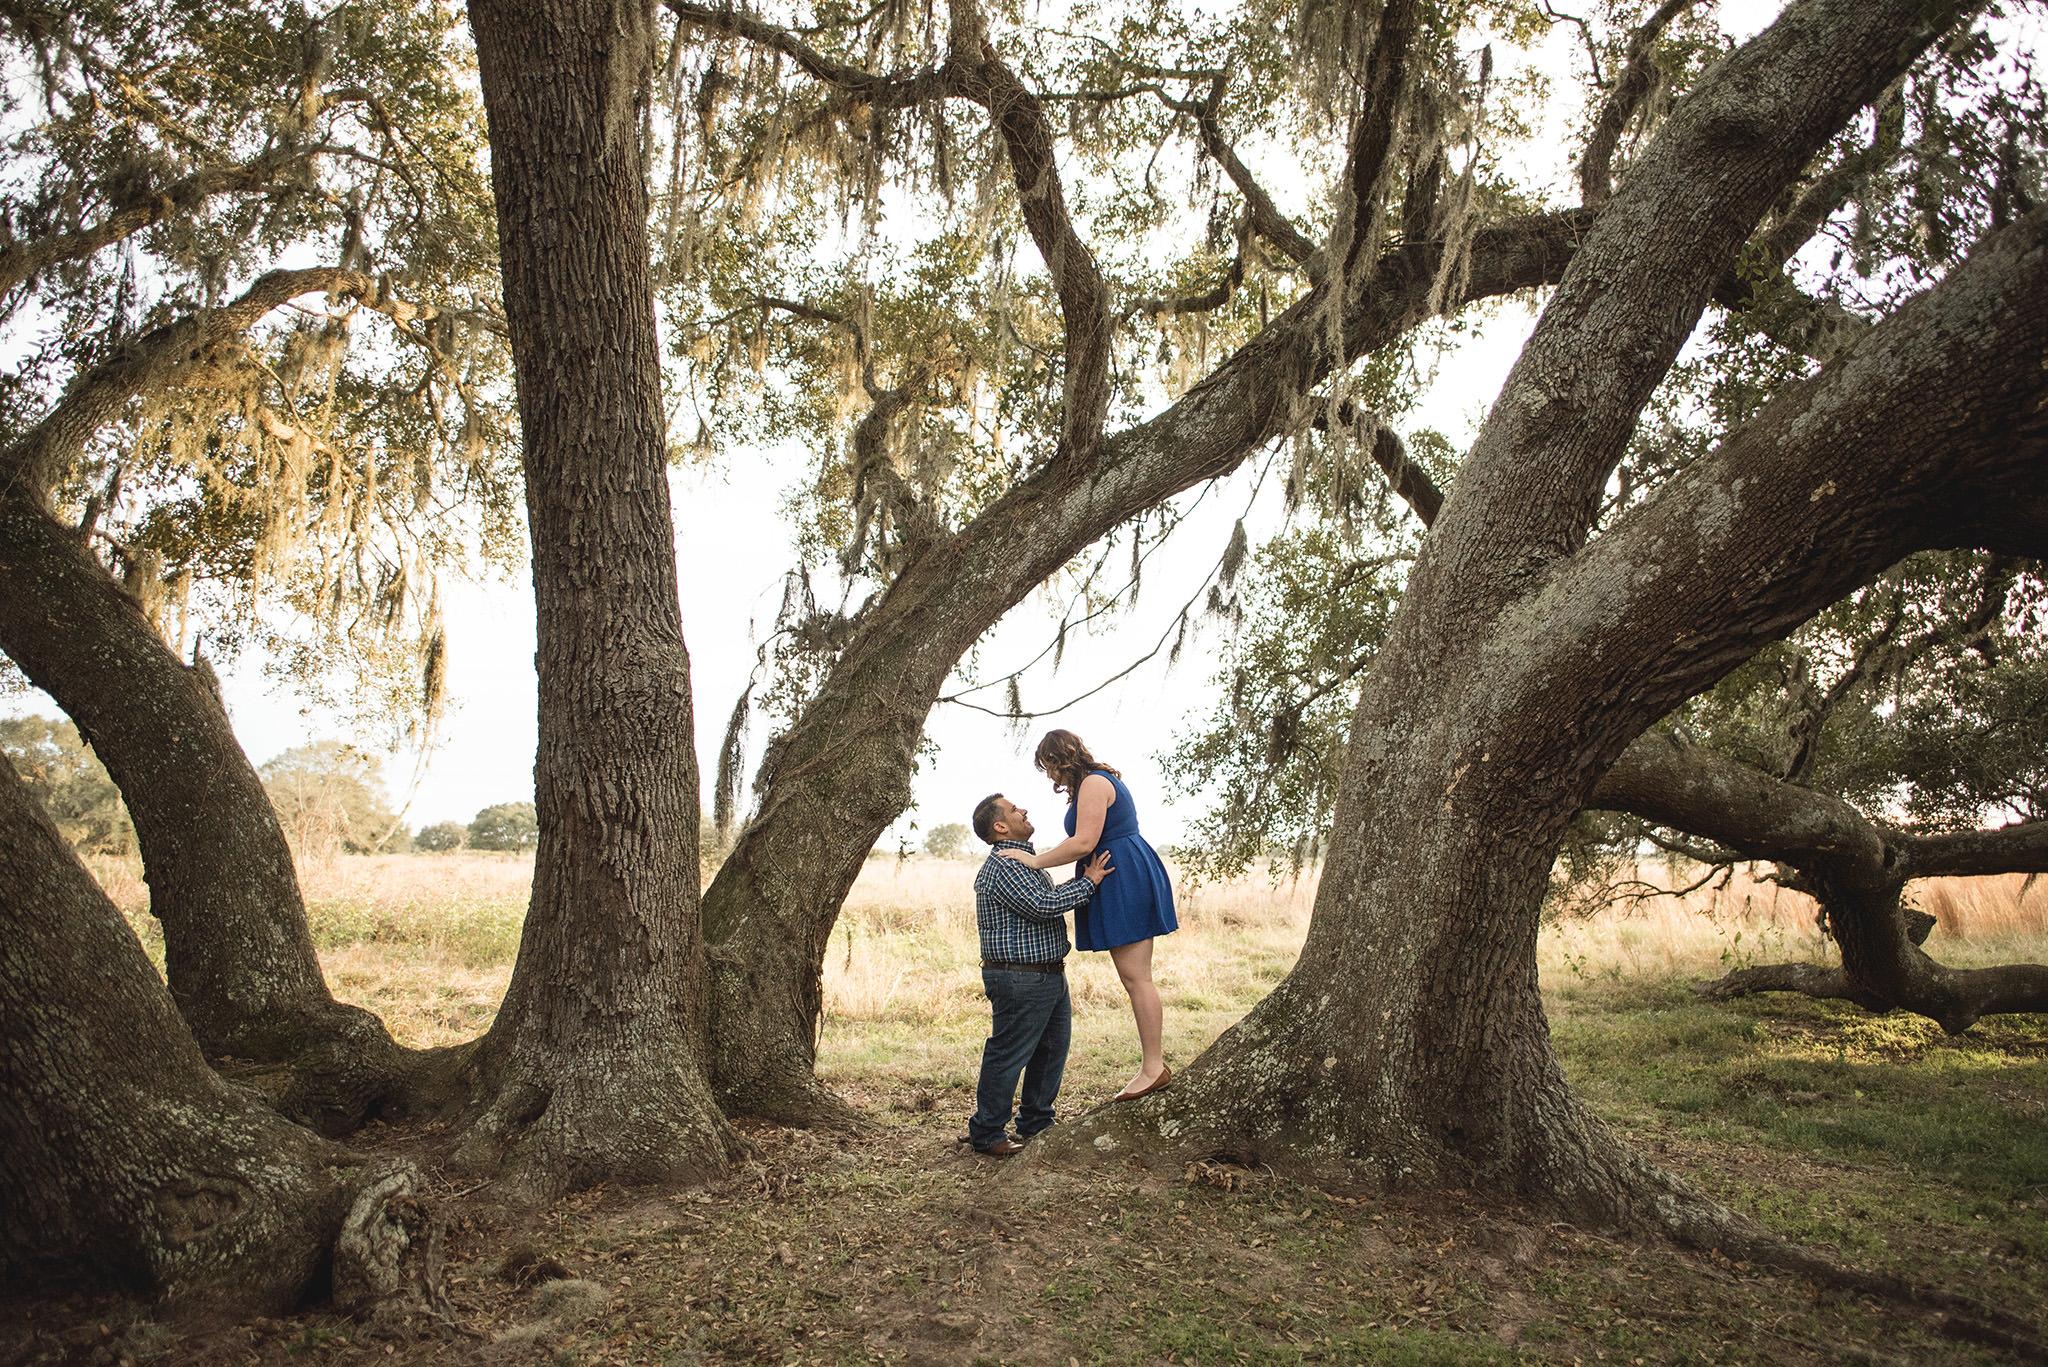 Brazos-Bend-Park-lifestyle-engagement-photography-121.jpg